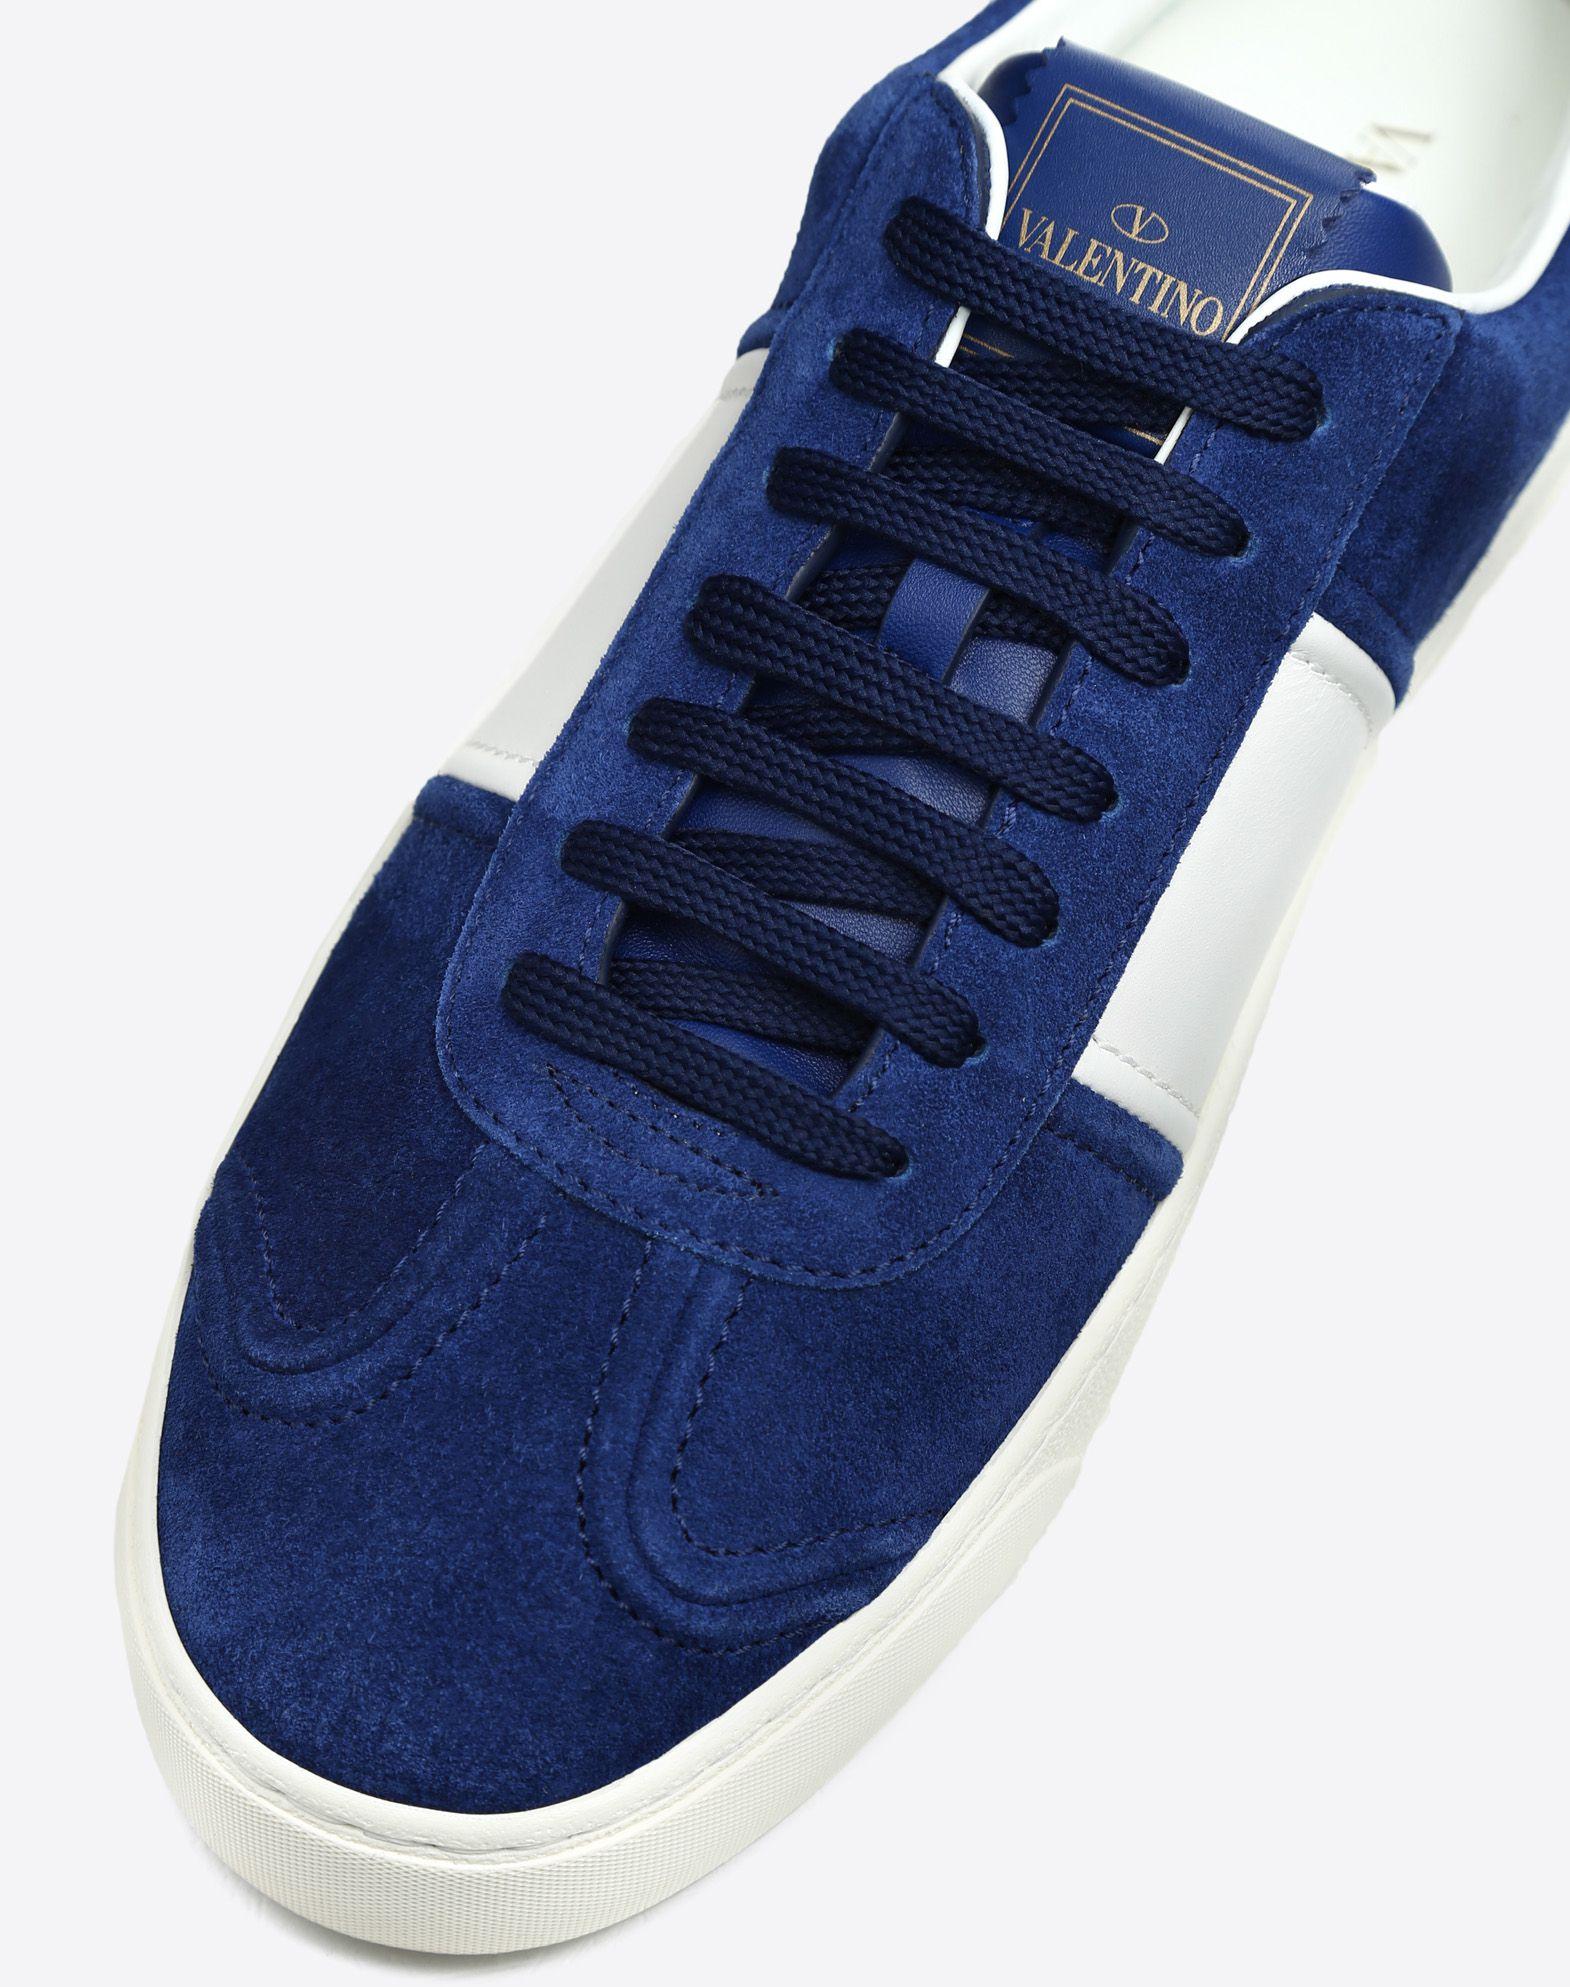 VALENTINO GARAVANI UOMO Flycrew Sneakers  LOW-TOP SNEAKERS U b